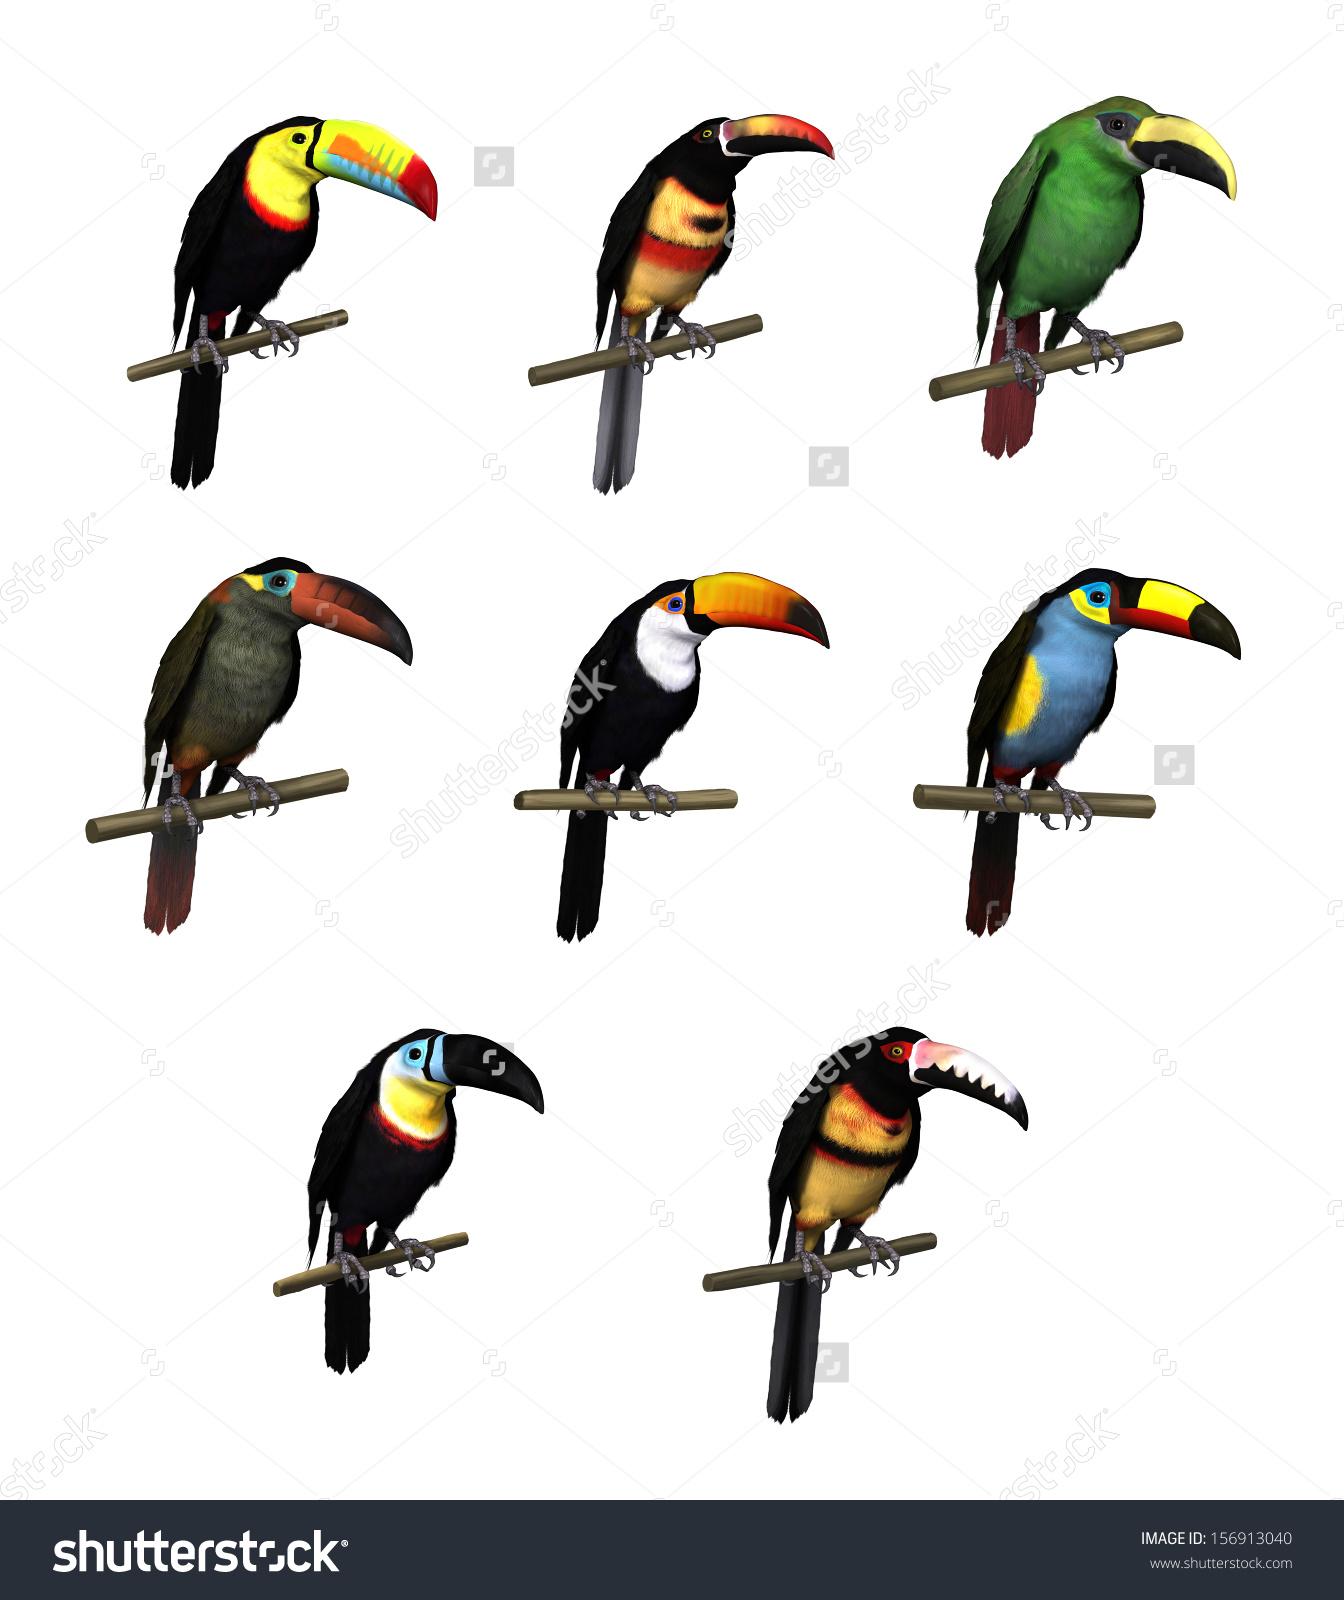 3d Render Toucan Species Keelbill Toucan Stock Illustration.